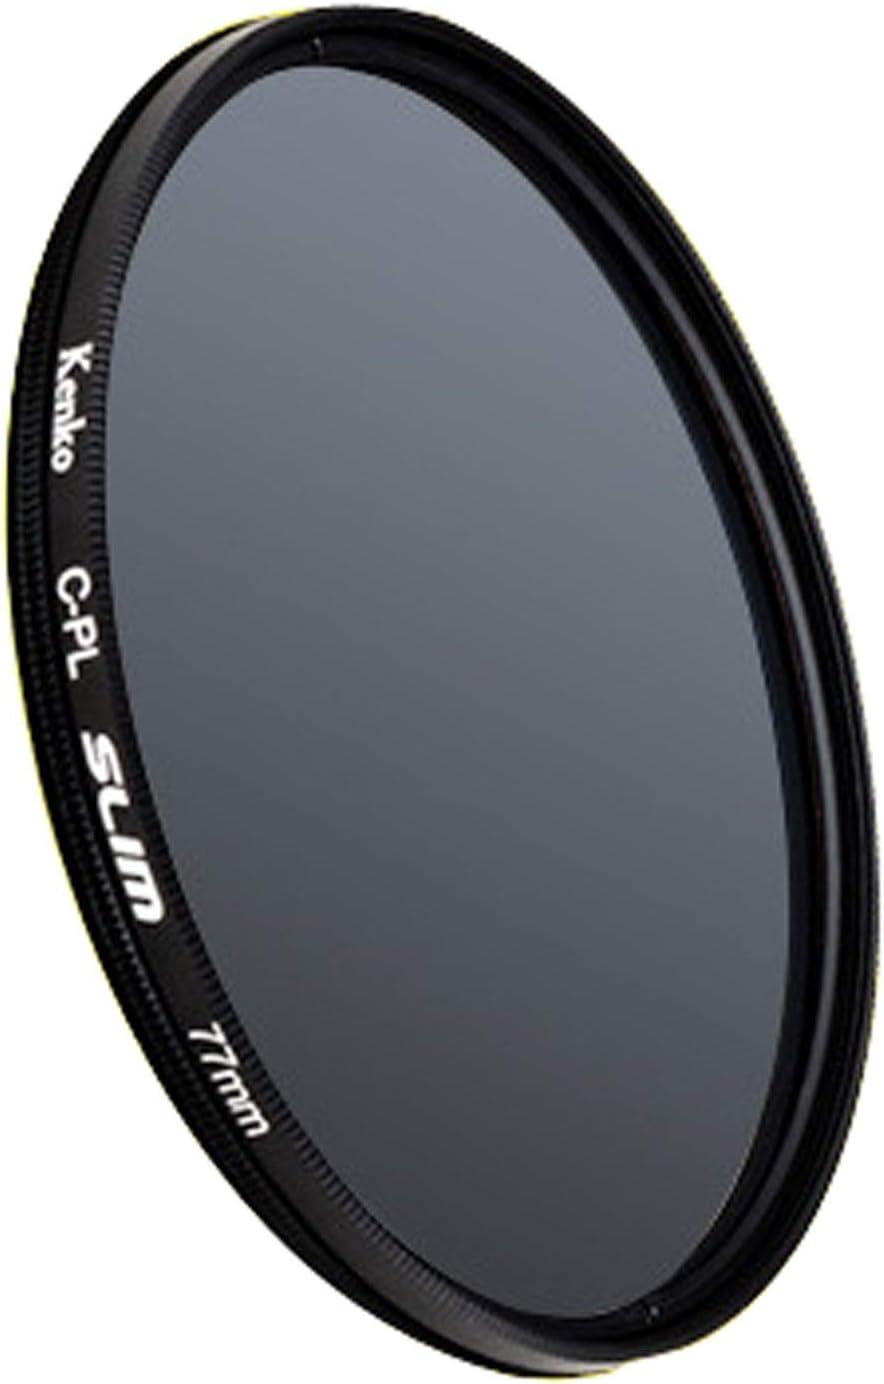 Size : 58mm Wangclj Filter Lens Polarization Filter Ultra-Thin CLEARPRO-CPL Ultra-Thin HD Rubber